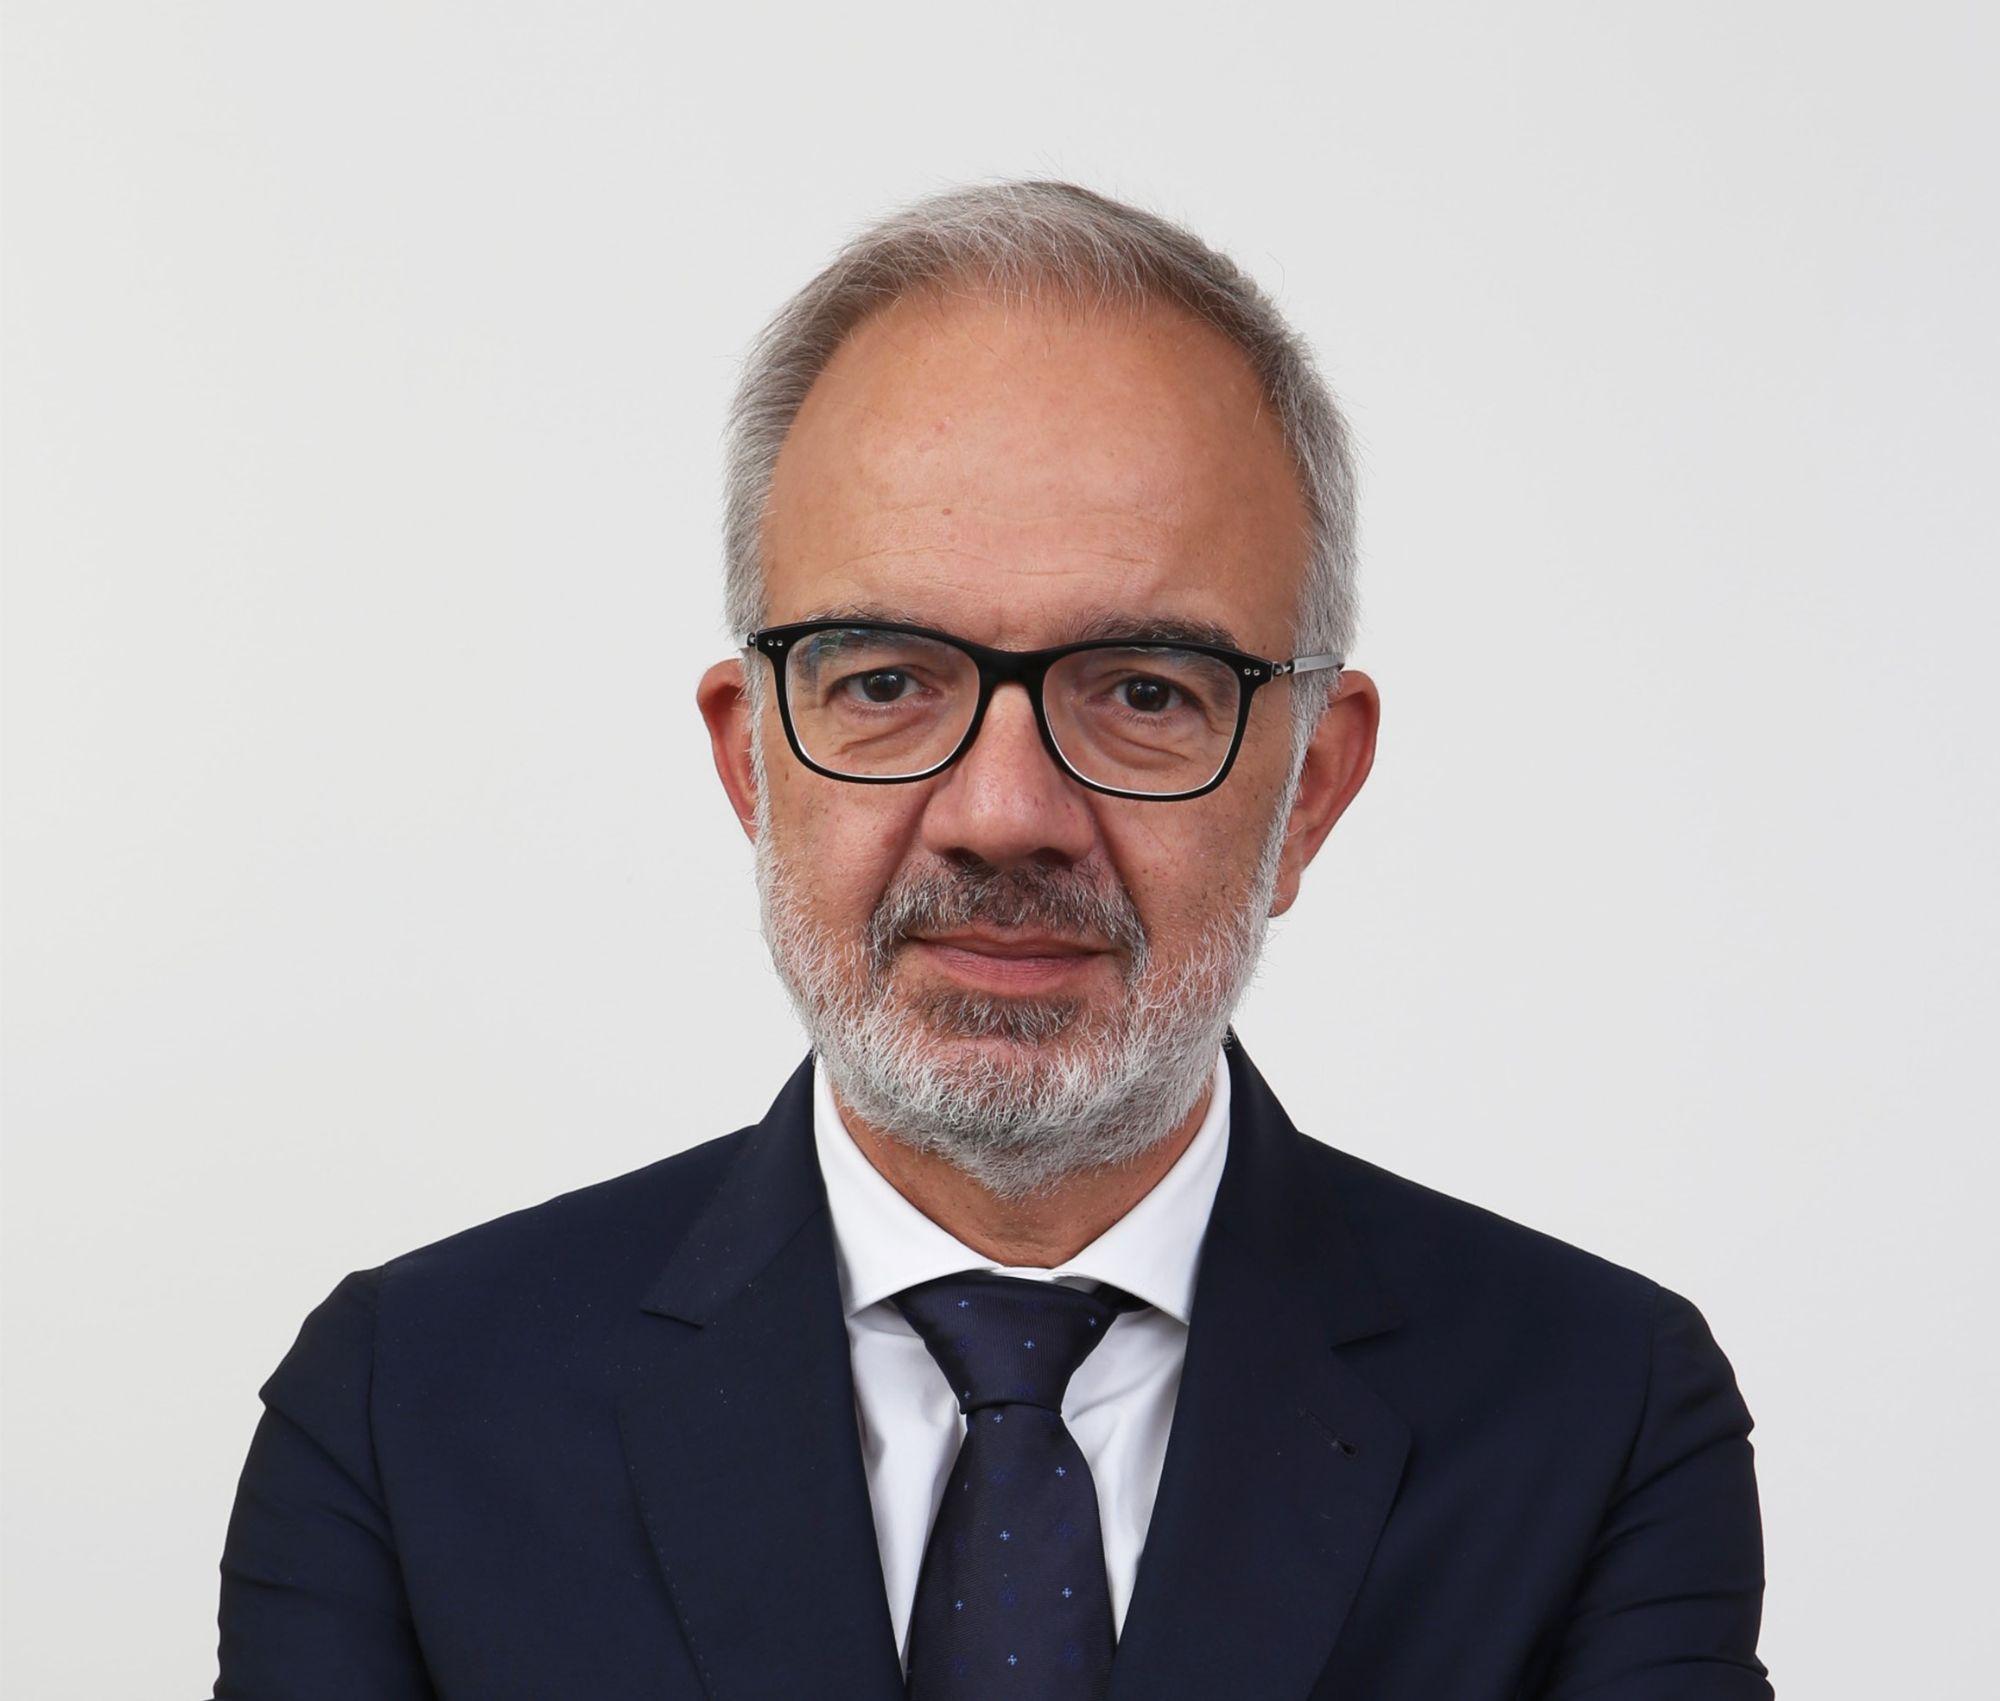 presidenteeuronicsmauriziominuti-1602501730.JPG